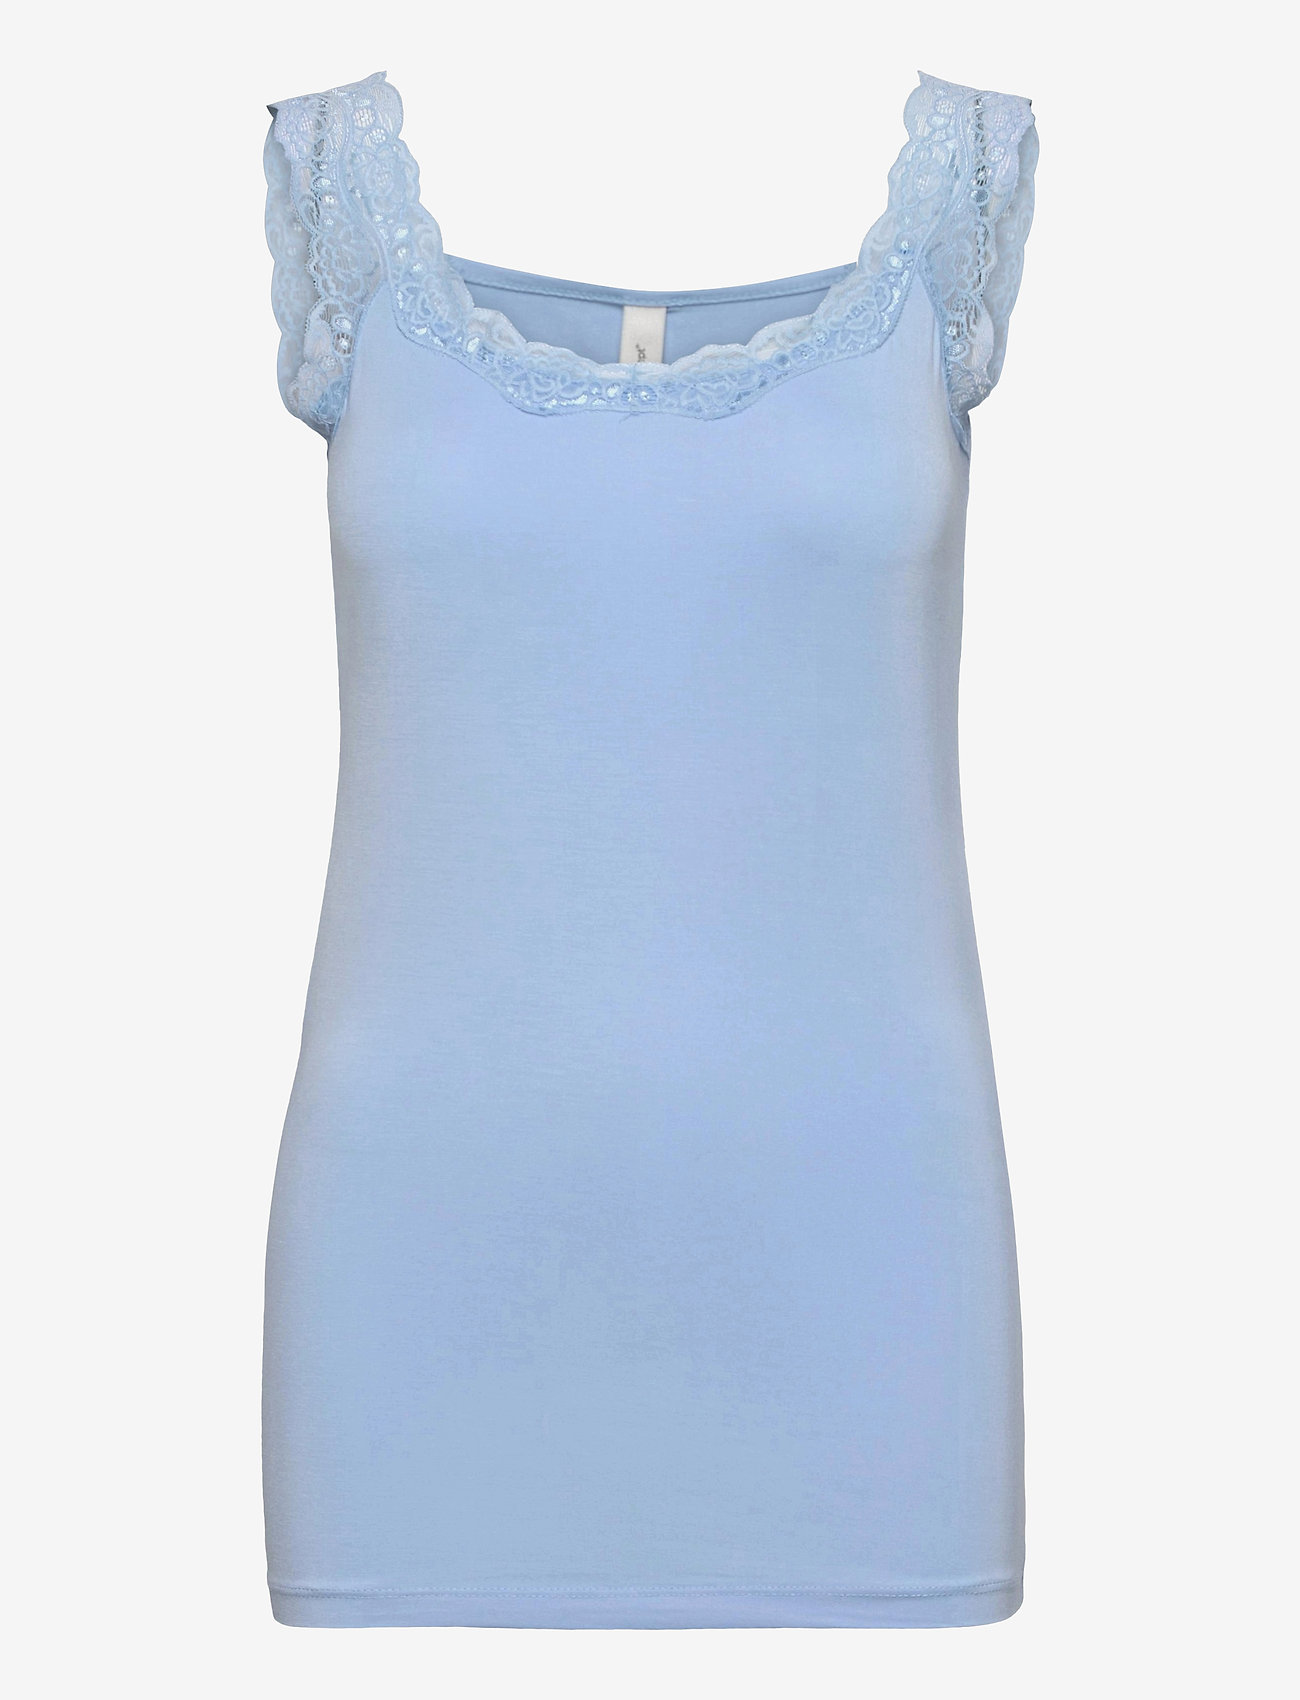 Soyaconcept - SC-MARICA - t-shirt & tops - powder blue - 0